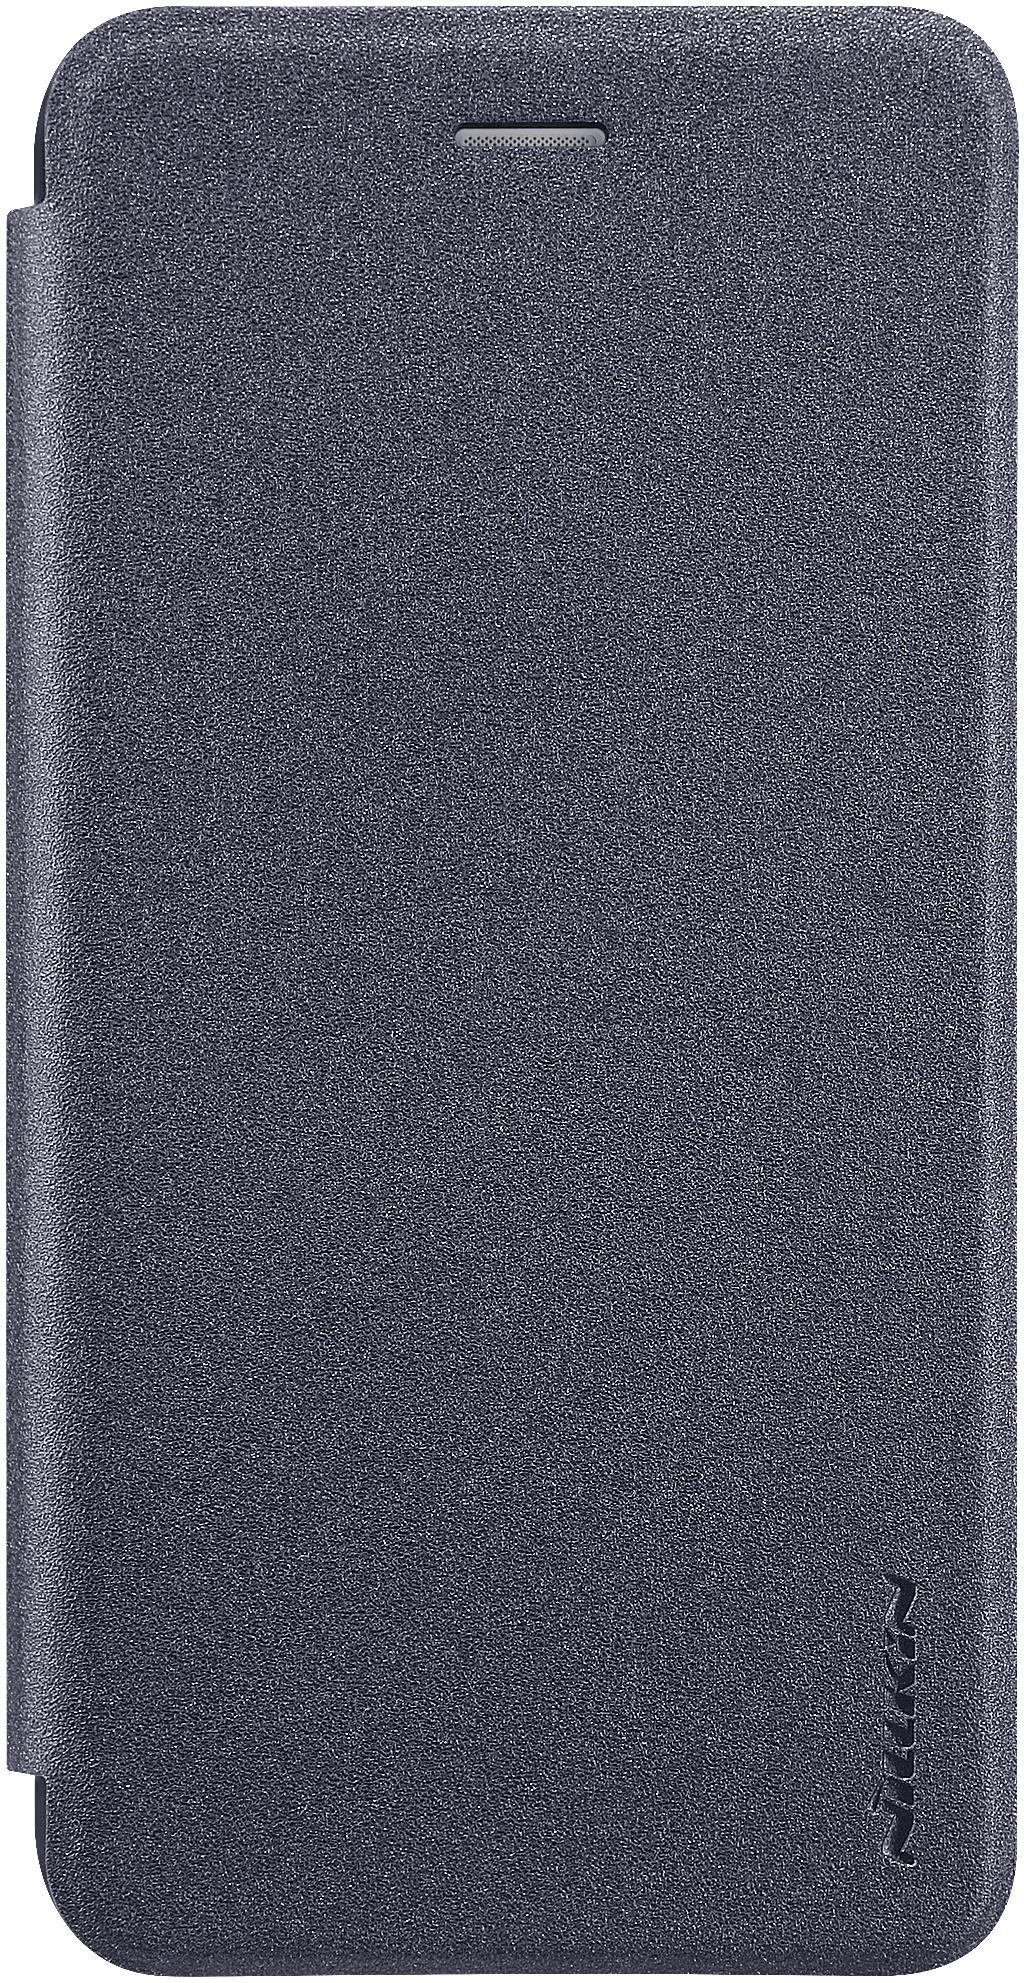 Чехол из искусственной кожи для Huawei P8 Lite (2017)/Honor 8 Lite